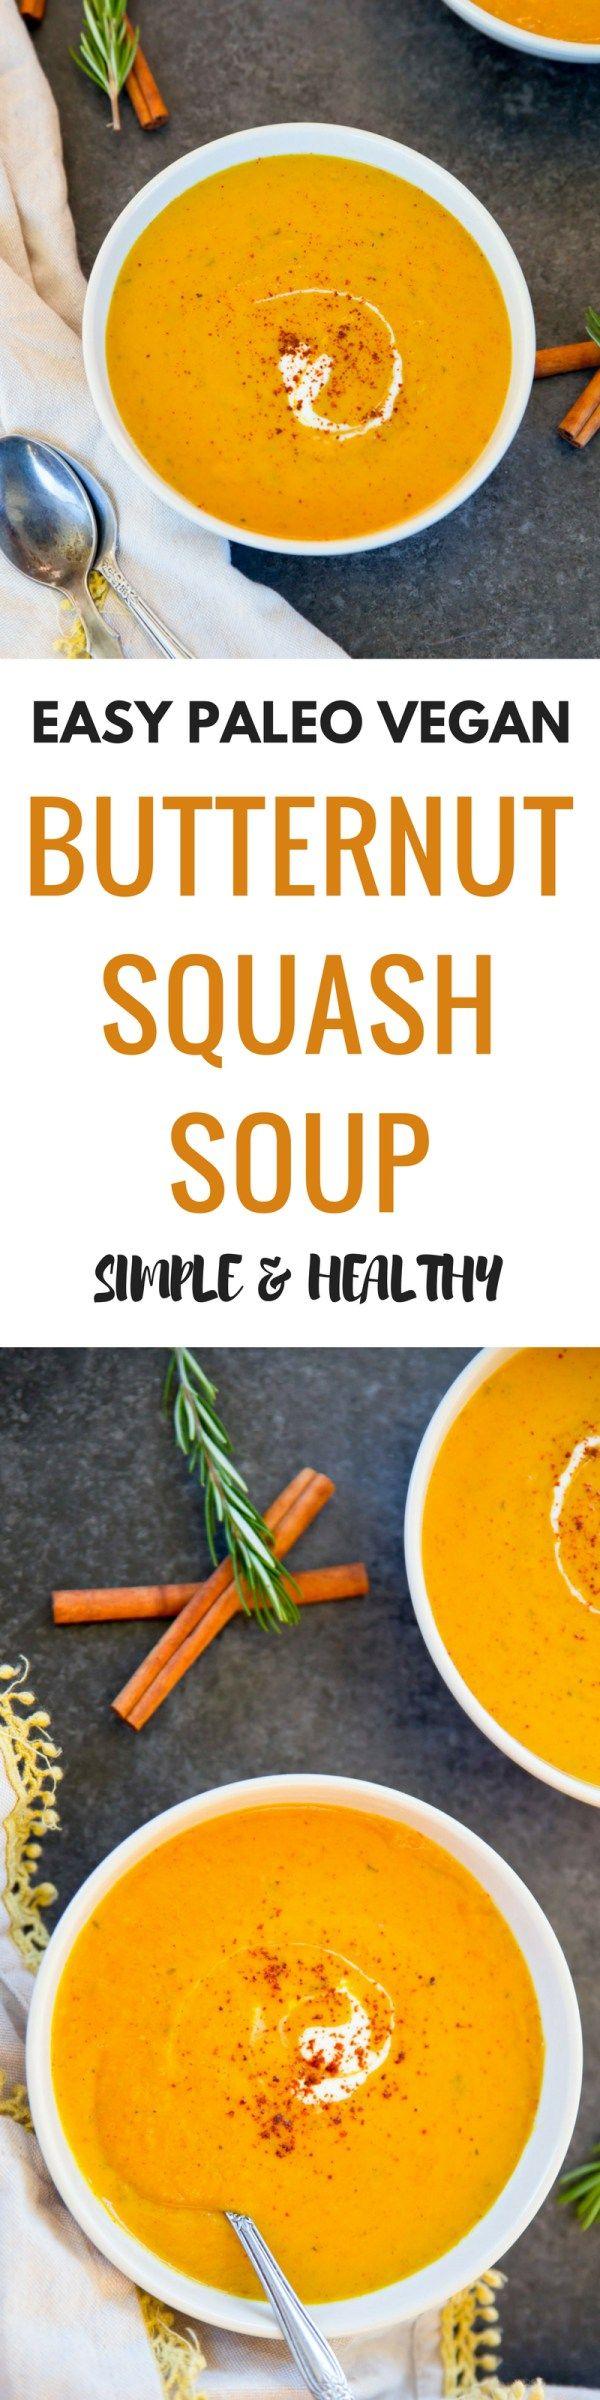 Easy paleo & vegan butternut squash soup recipe. Paleo butternut squash soup. Simple and healthy butternut squash soup recipe- yum! Also whole 30 friendly!